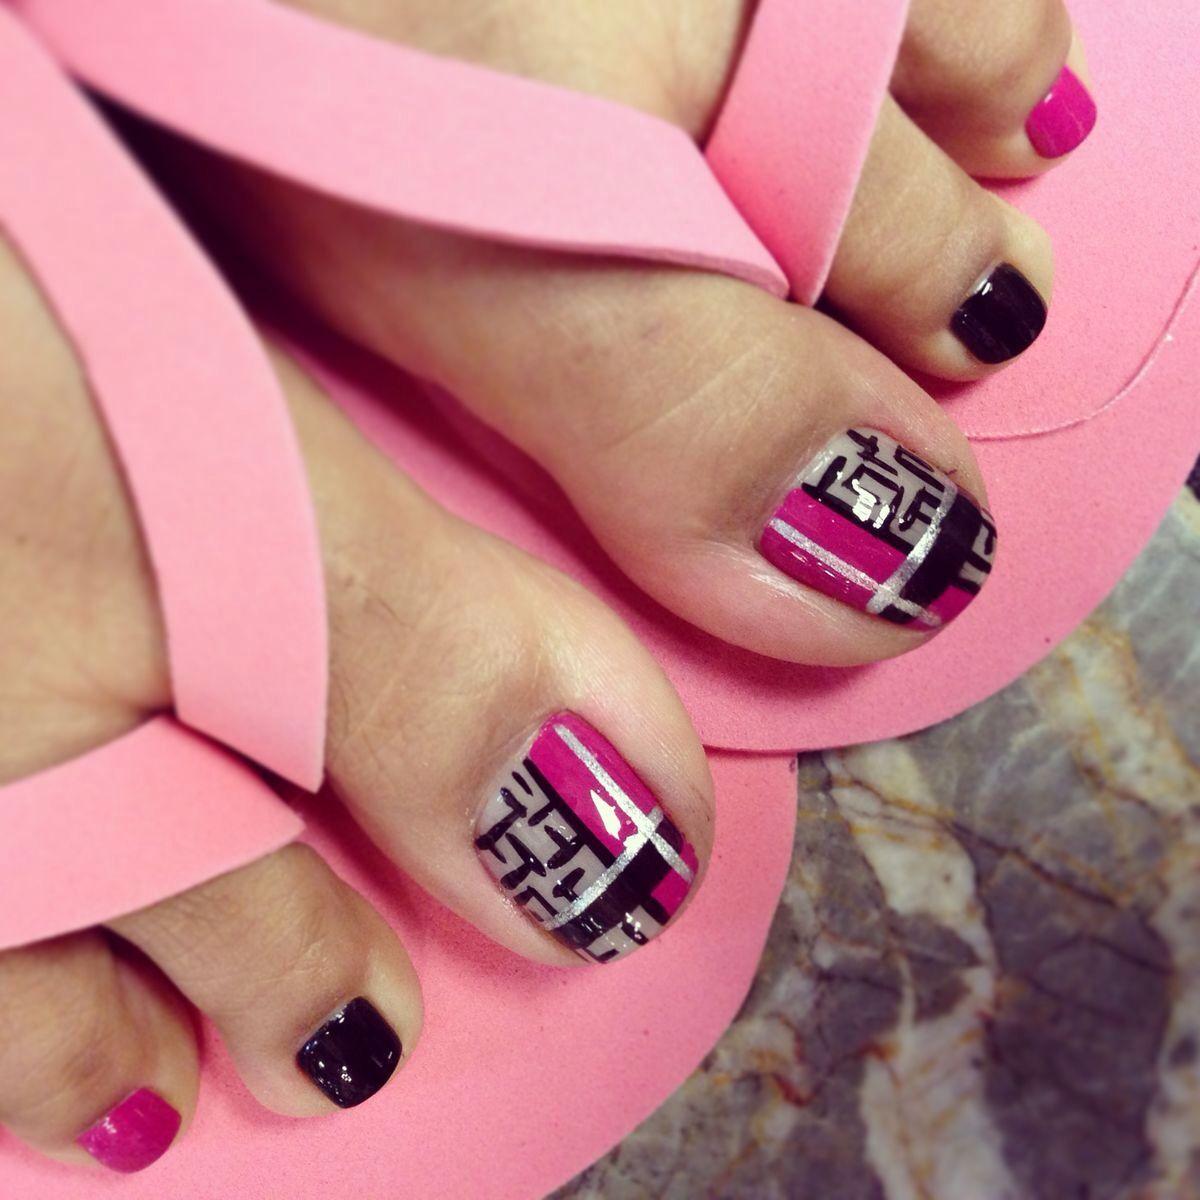 Pin von Sylvia Thompson auf Nails | Pinterest | Designs